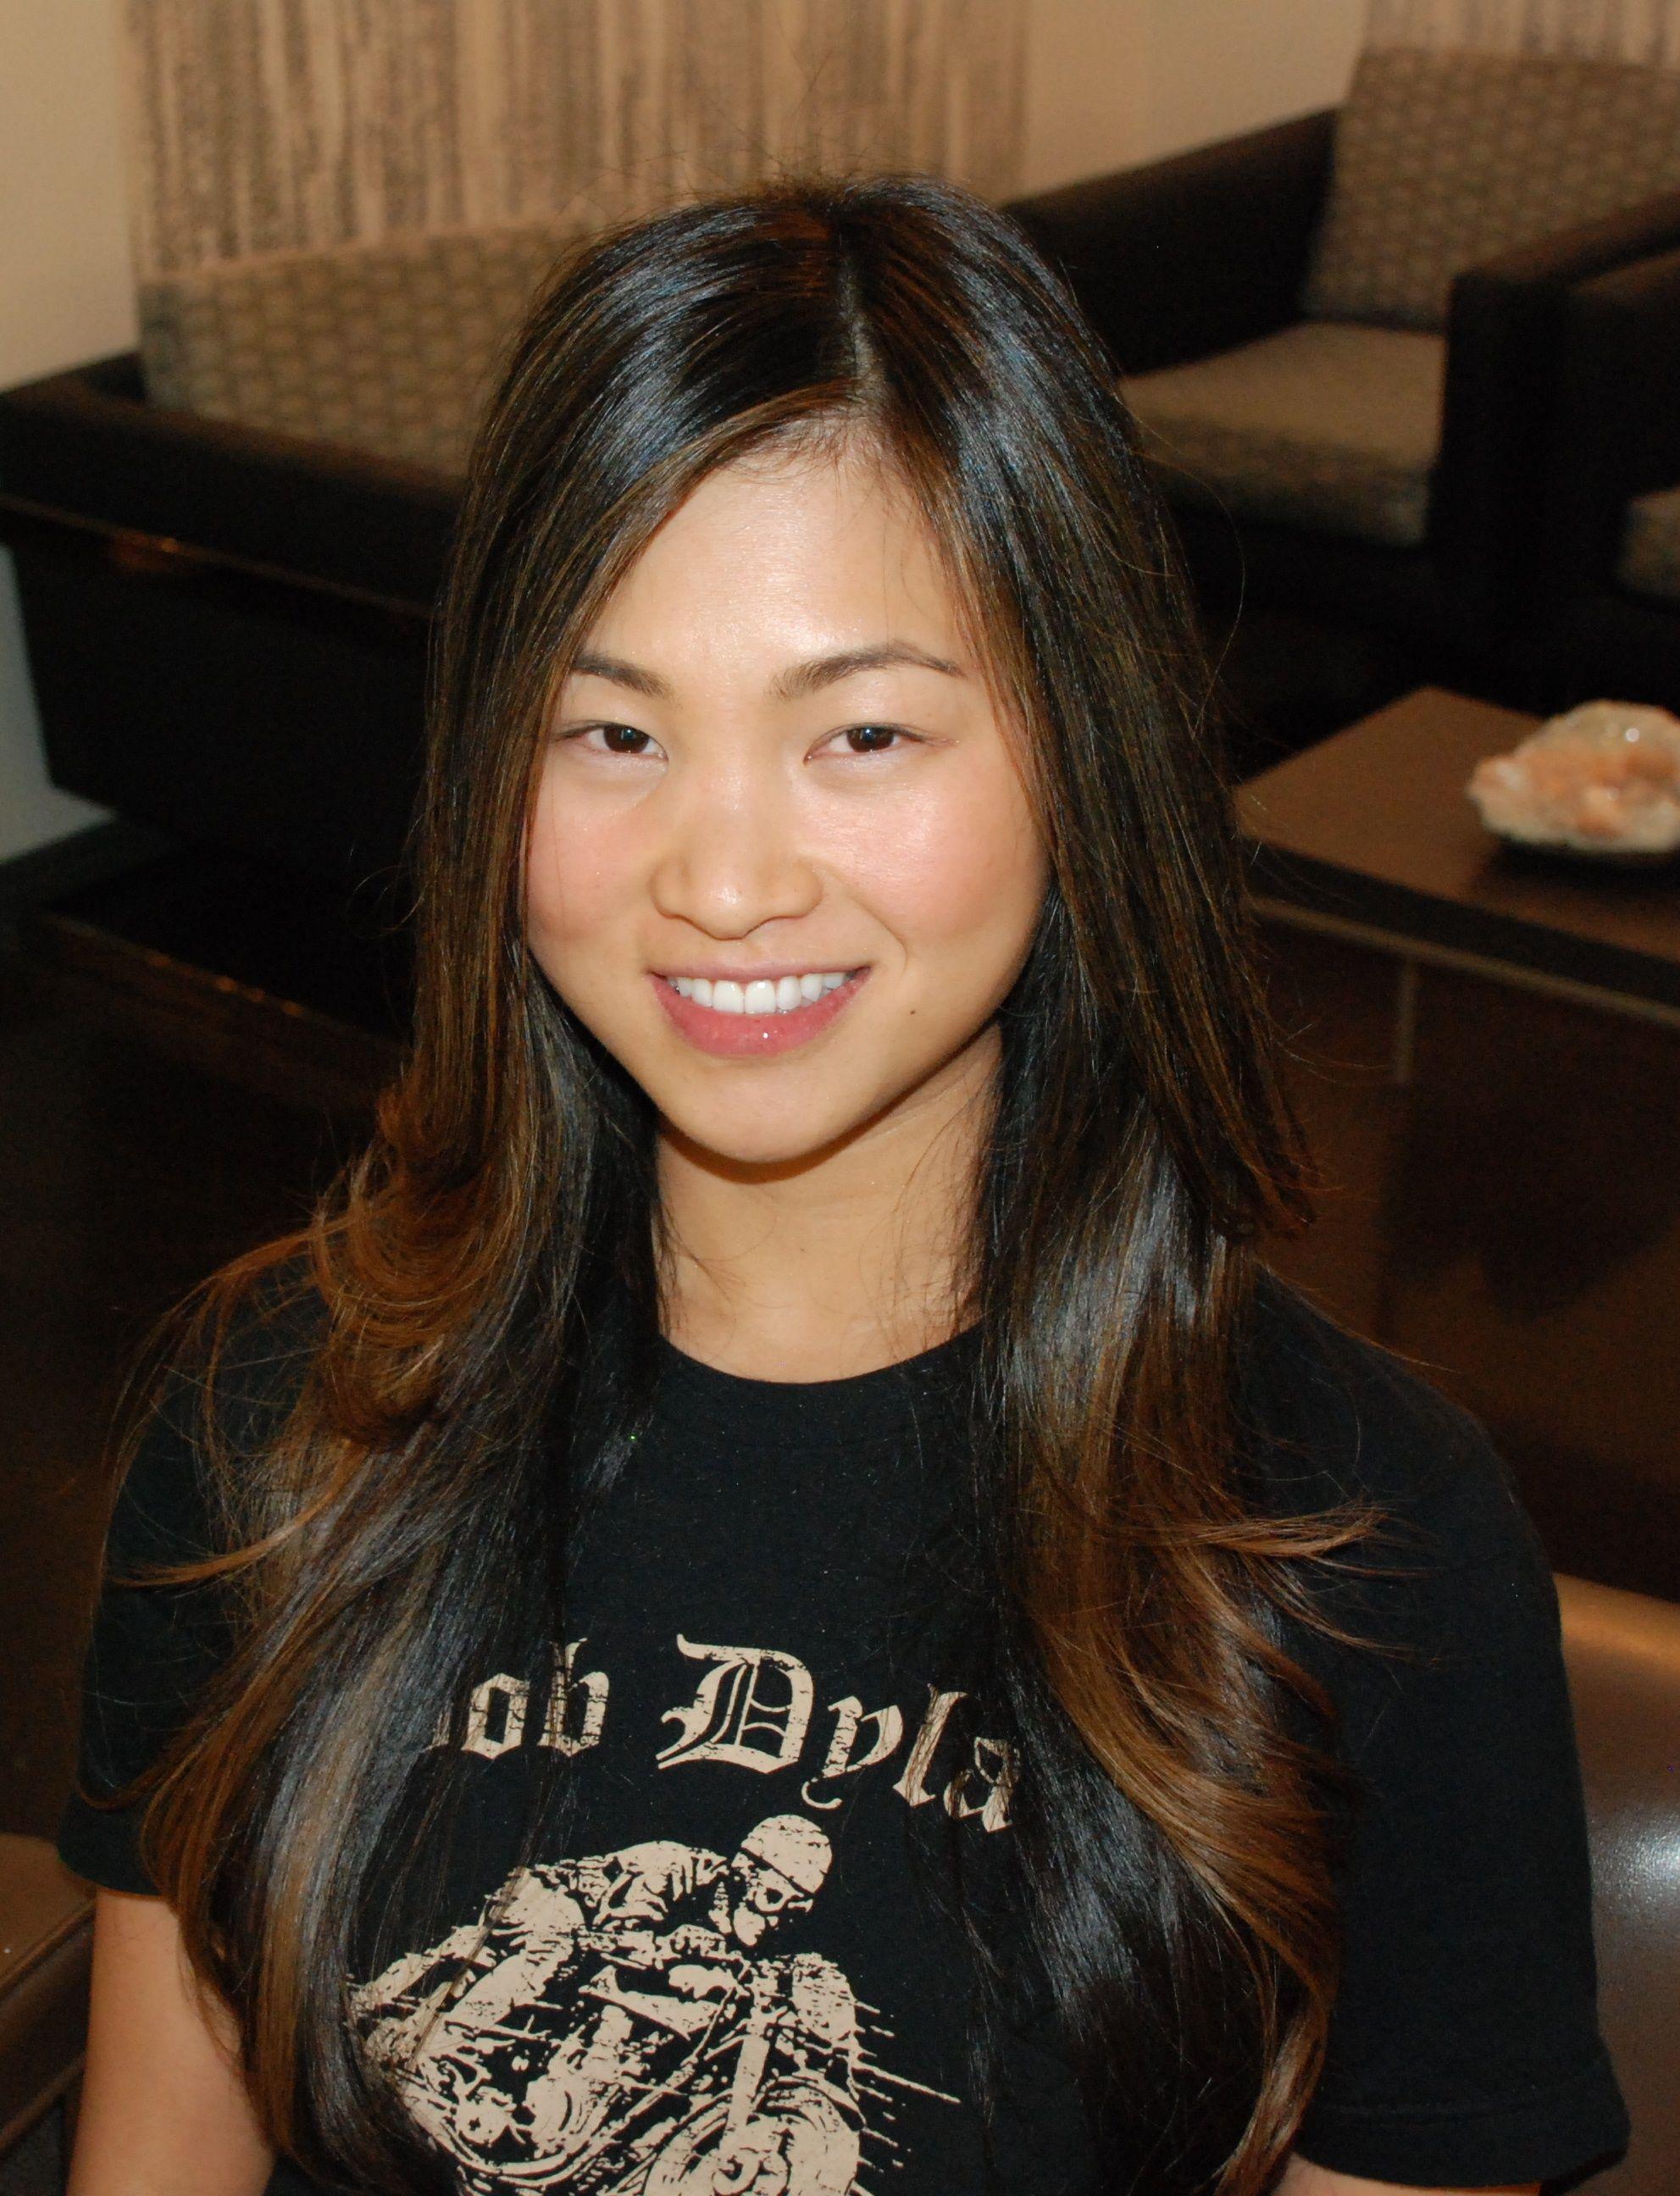 Hair Color Skin Tones Hair Nails Makeup Pinterest Dark Hair